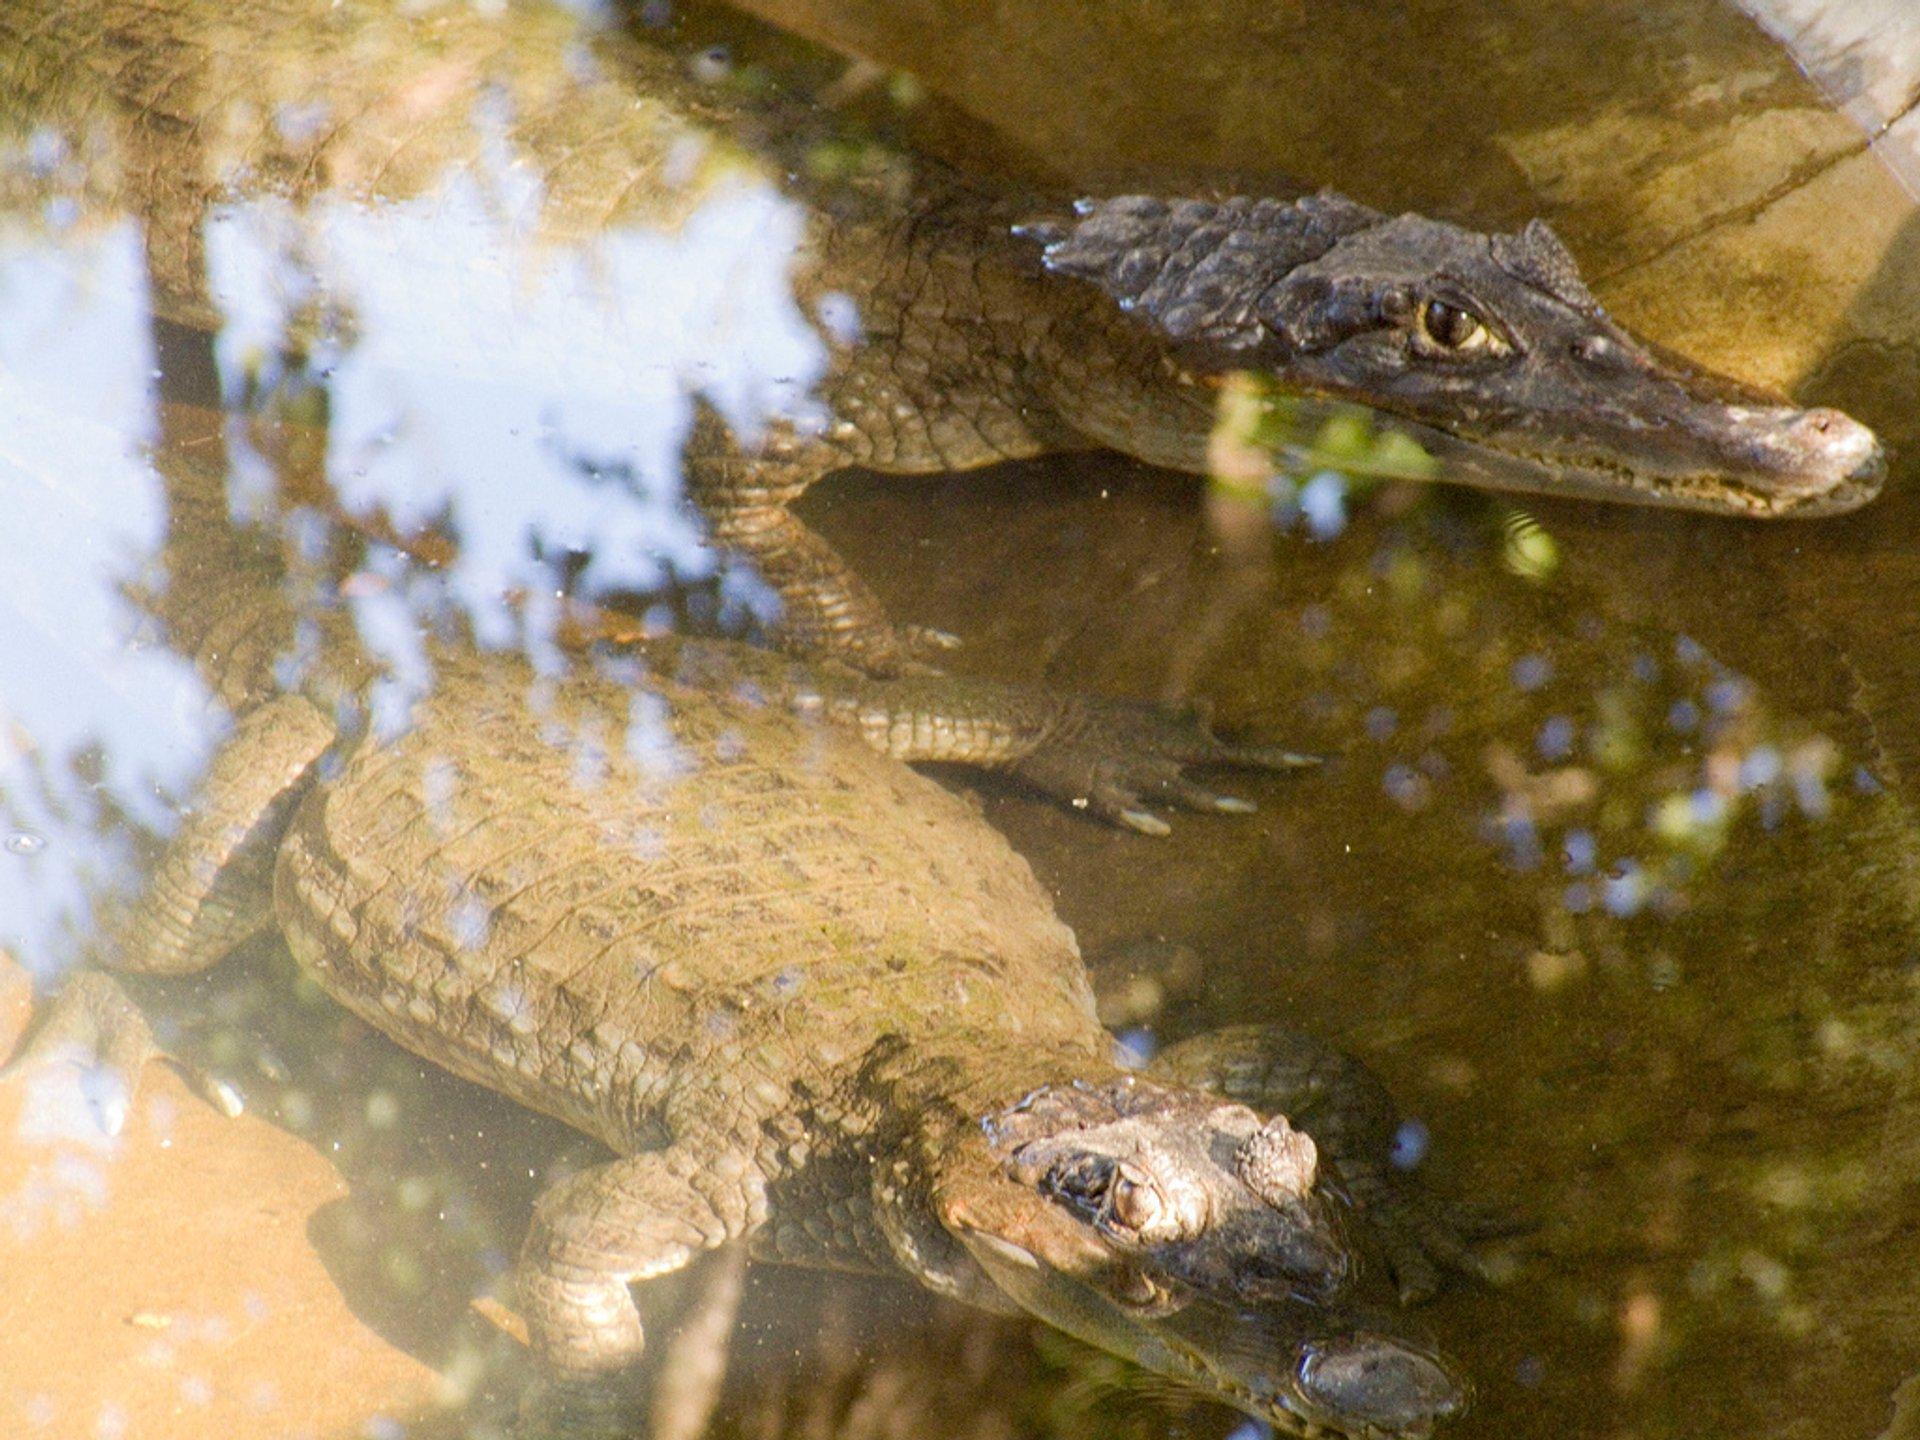 Crocodile Watching in Goa 2020 - Best Time